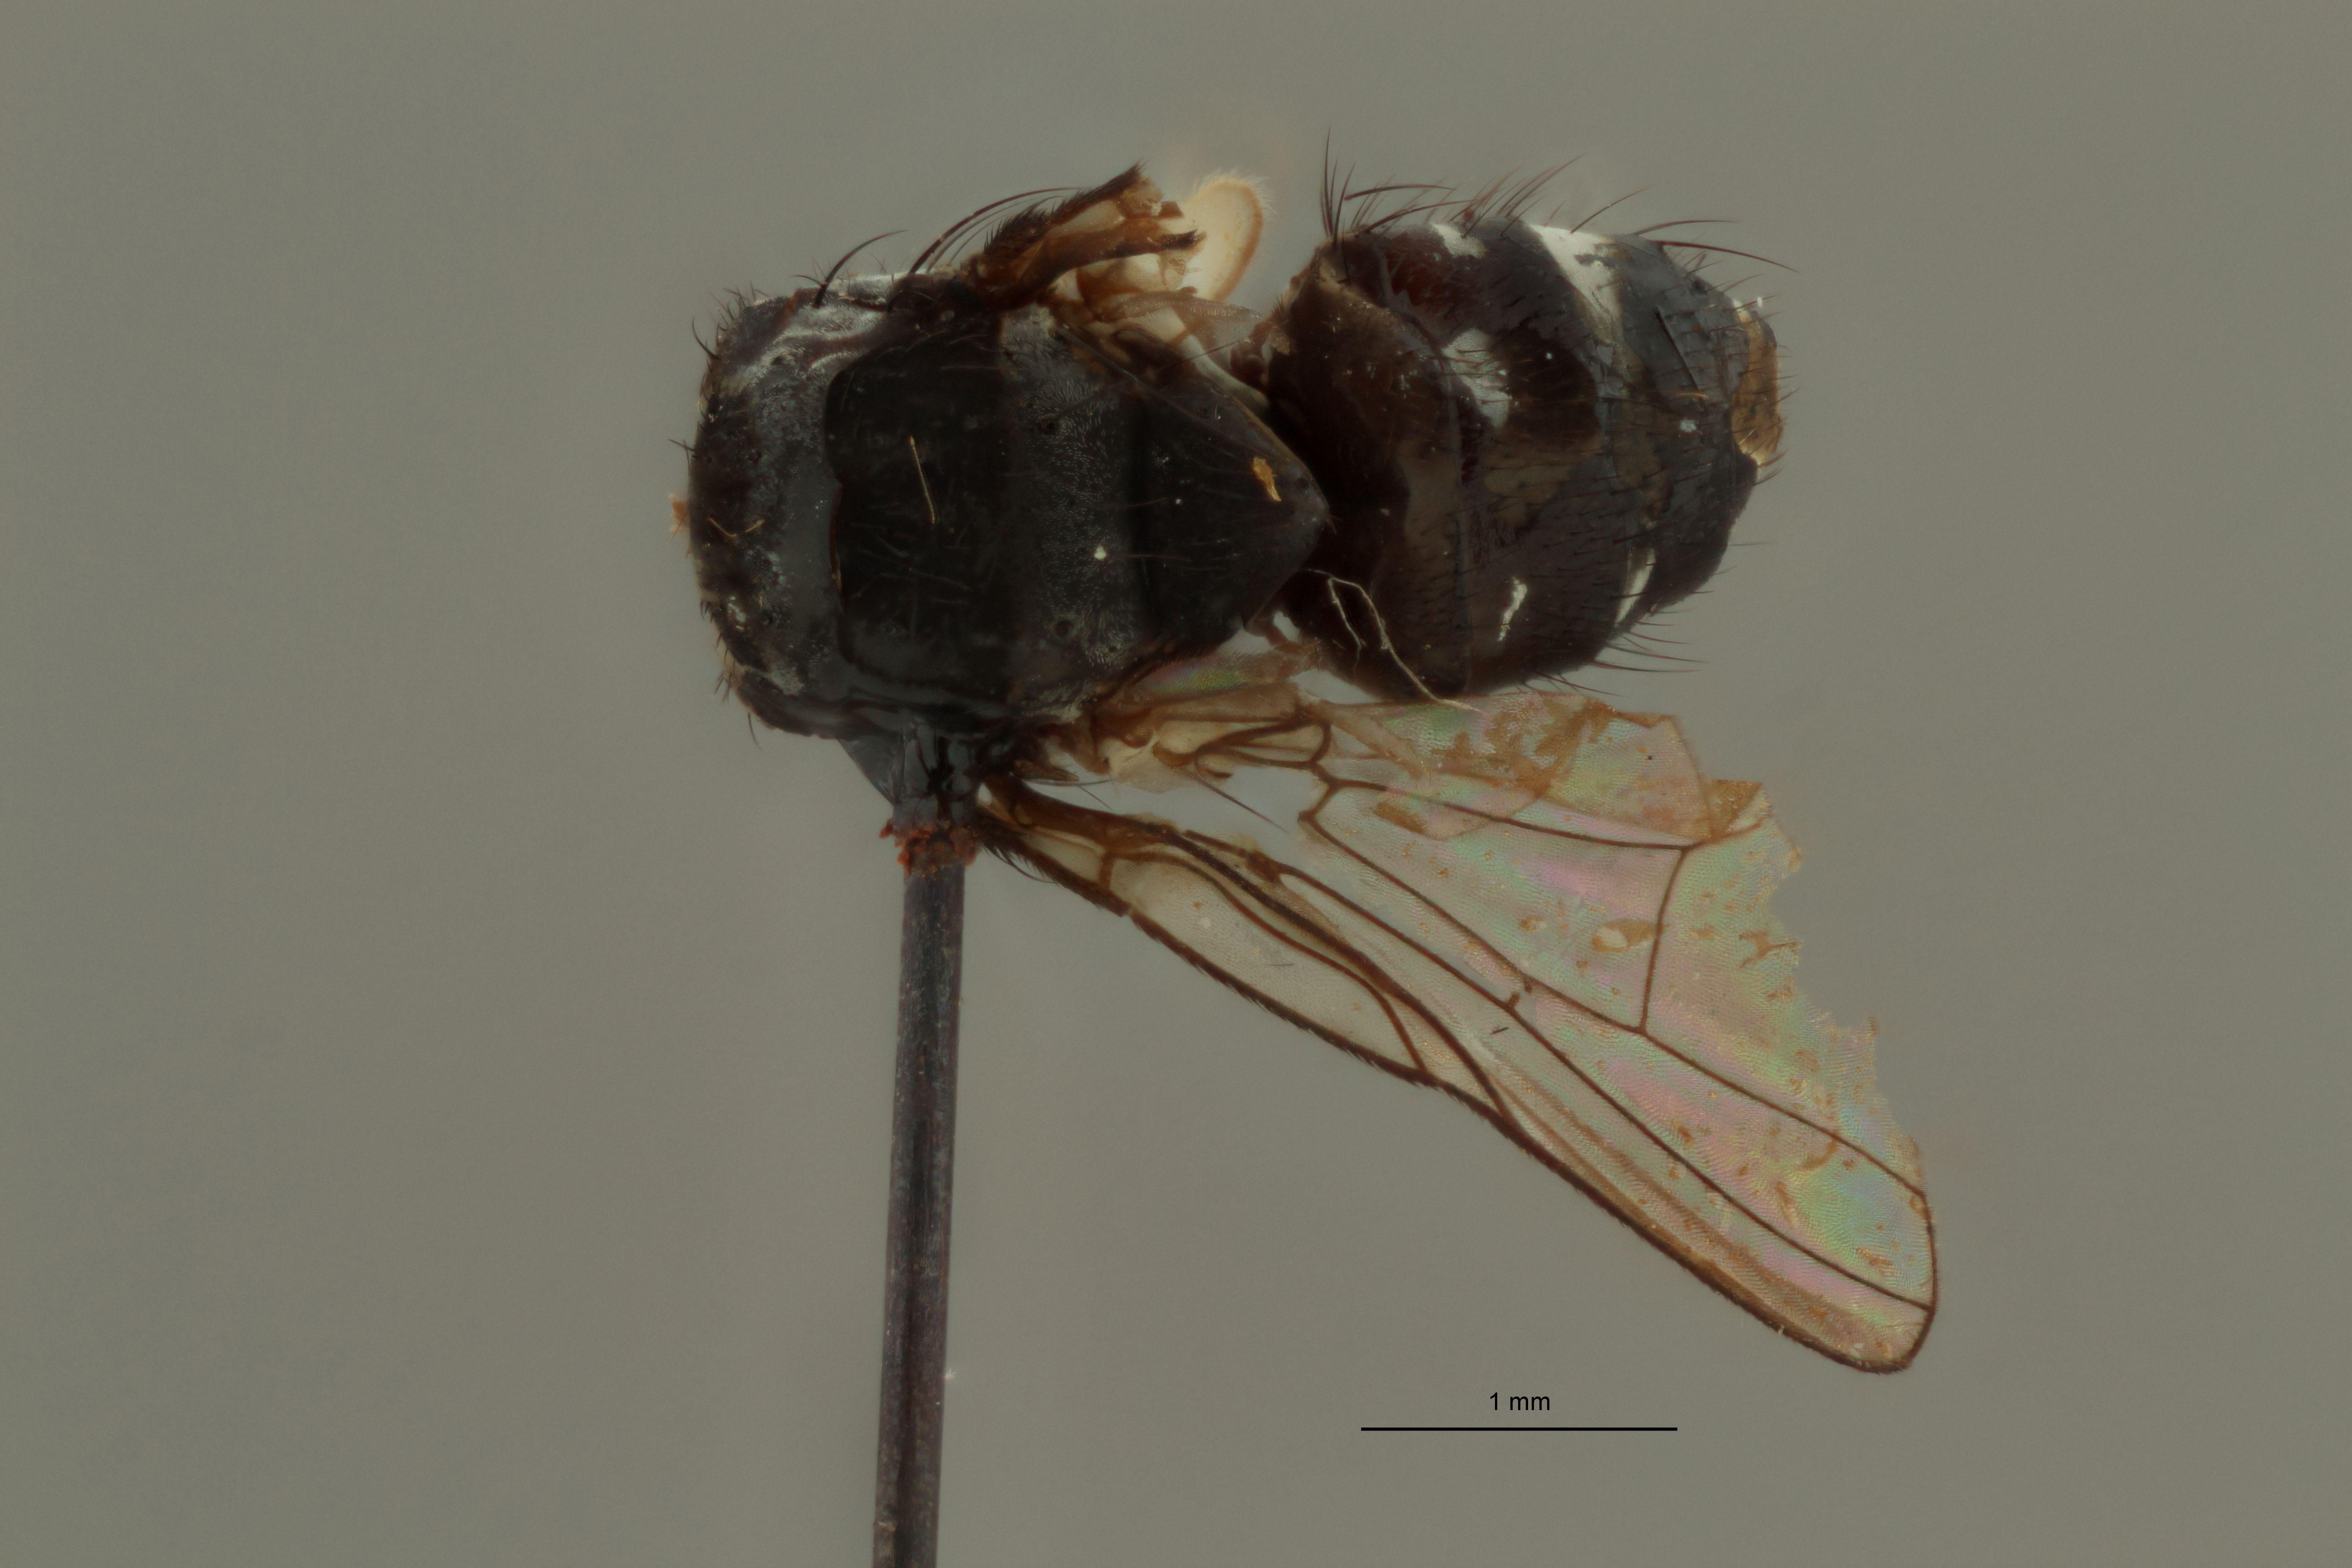 Limnophora parviseta t D.jpg